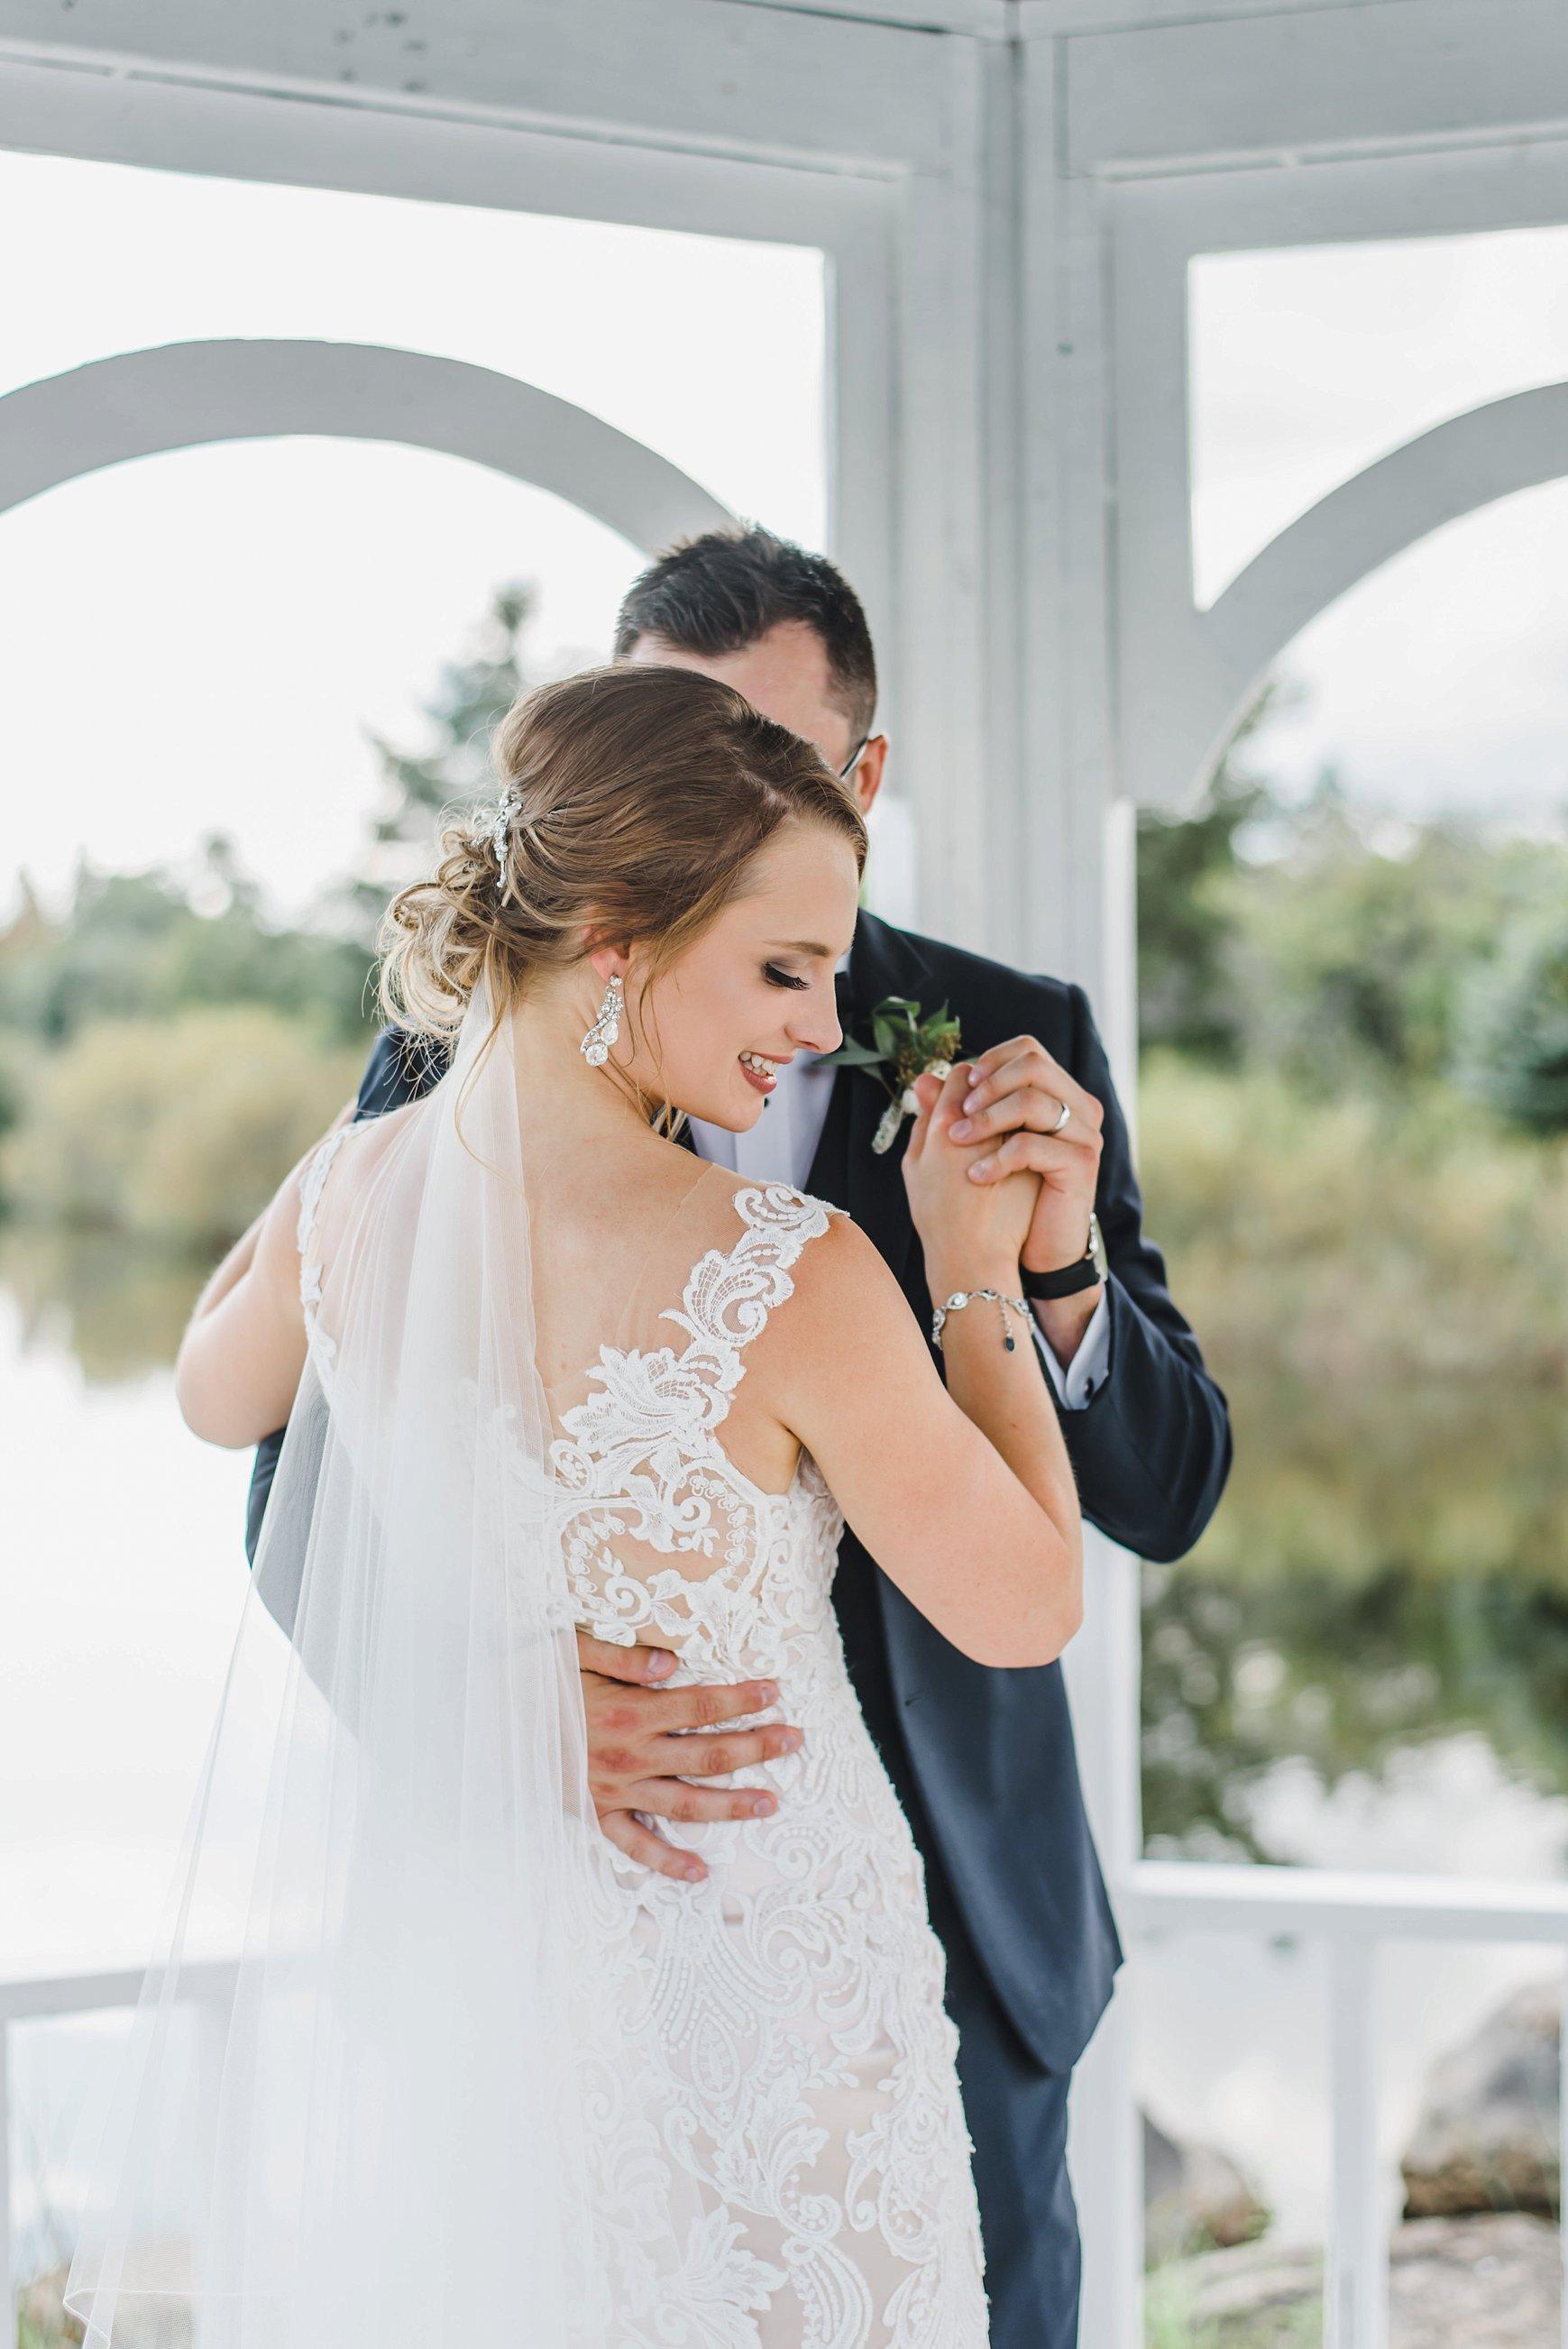 light airy indie fine art ottawa wedding photographer | Ali and Batoul Photography_1295.jpg